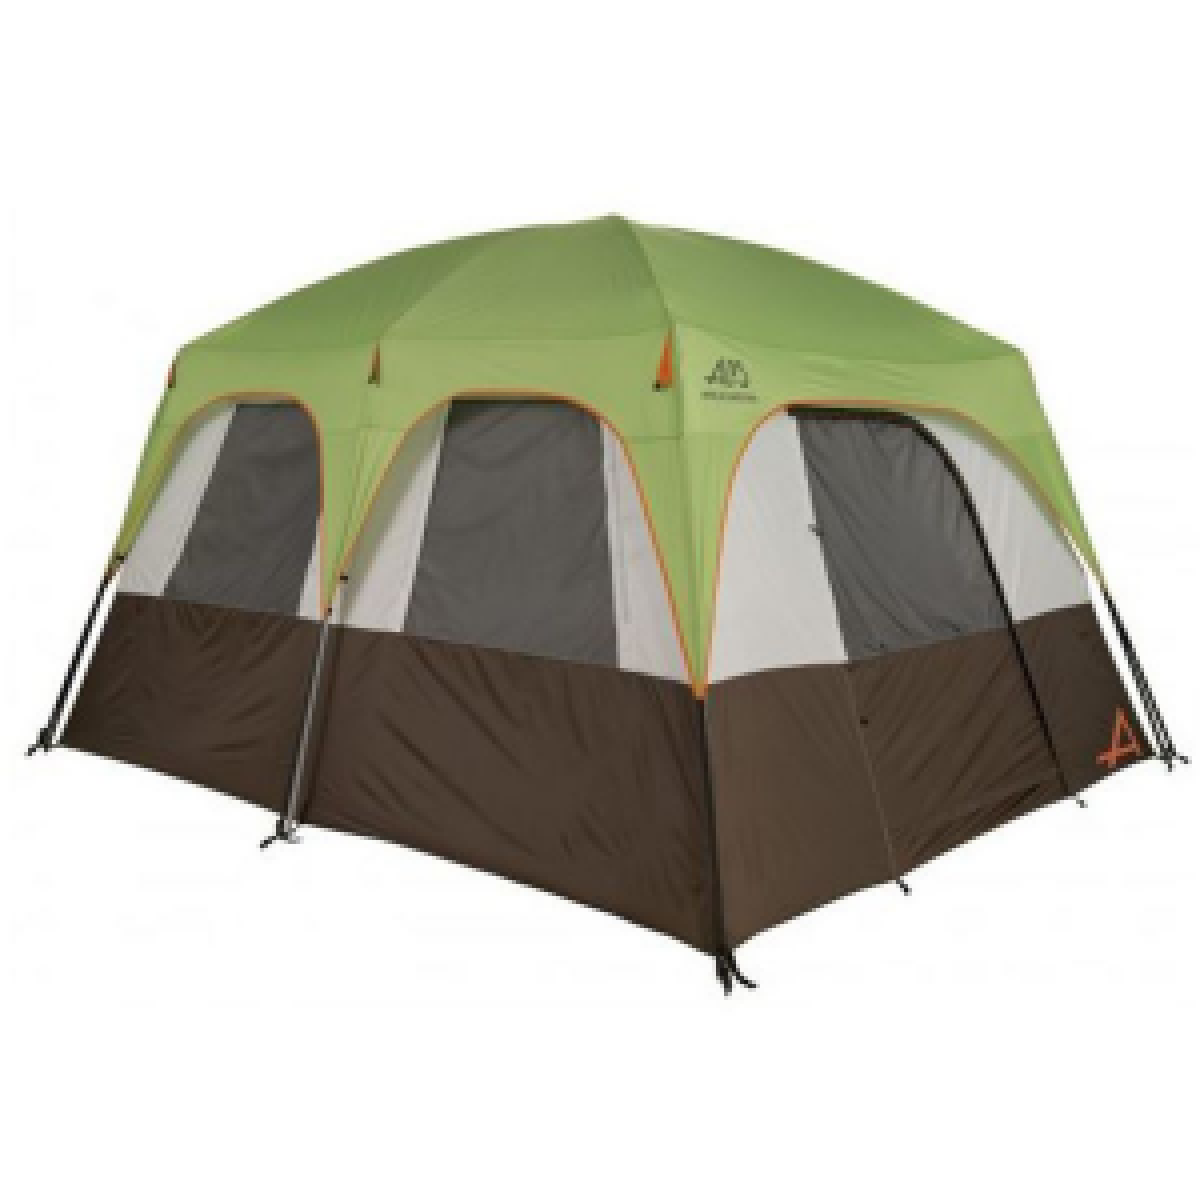 ALPS Mountaineering C& Creek 6 Two Room Tent 6-Person 3-Season Tent  sc 1 st  Pinterest & ALPS Mountaineering Camp Creek 6 Two Room Tent: 6-Person 3-Season ...